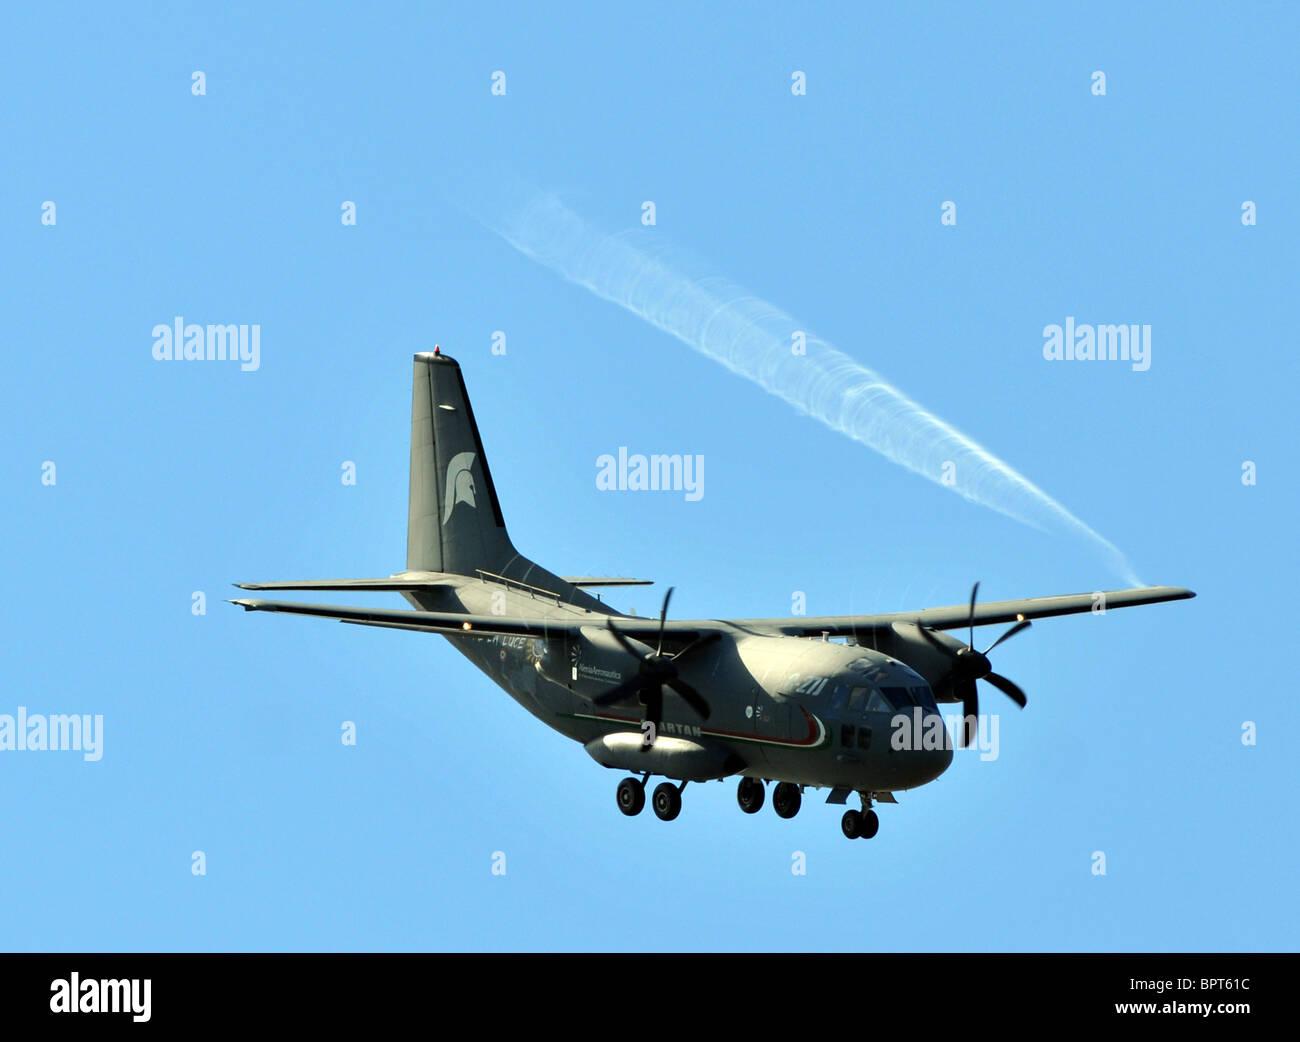 Spartan C-27J Aircraft military transport plane USAF - Stock Image